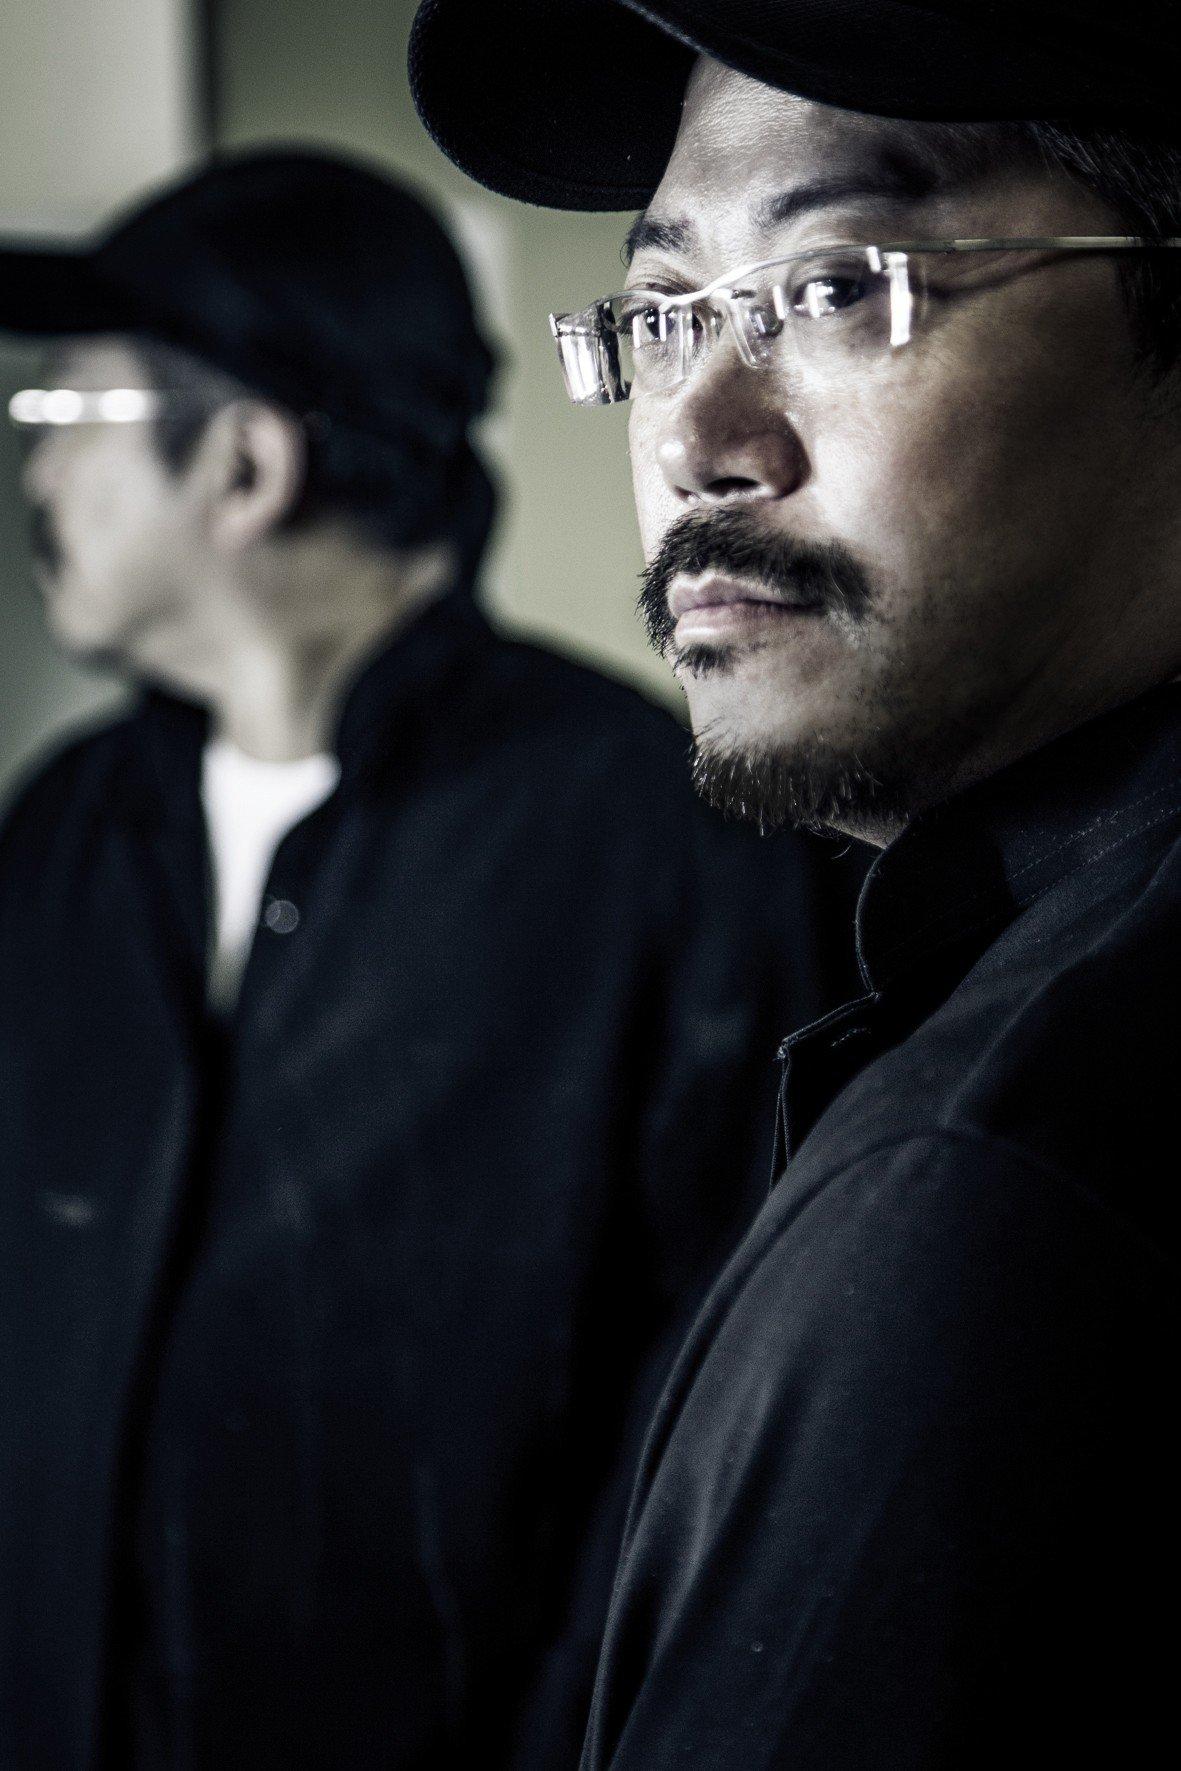 Costumes by Hong Kong's Oscar-winning art director Tim Yip